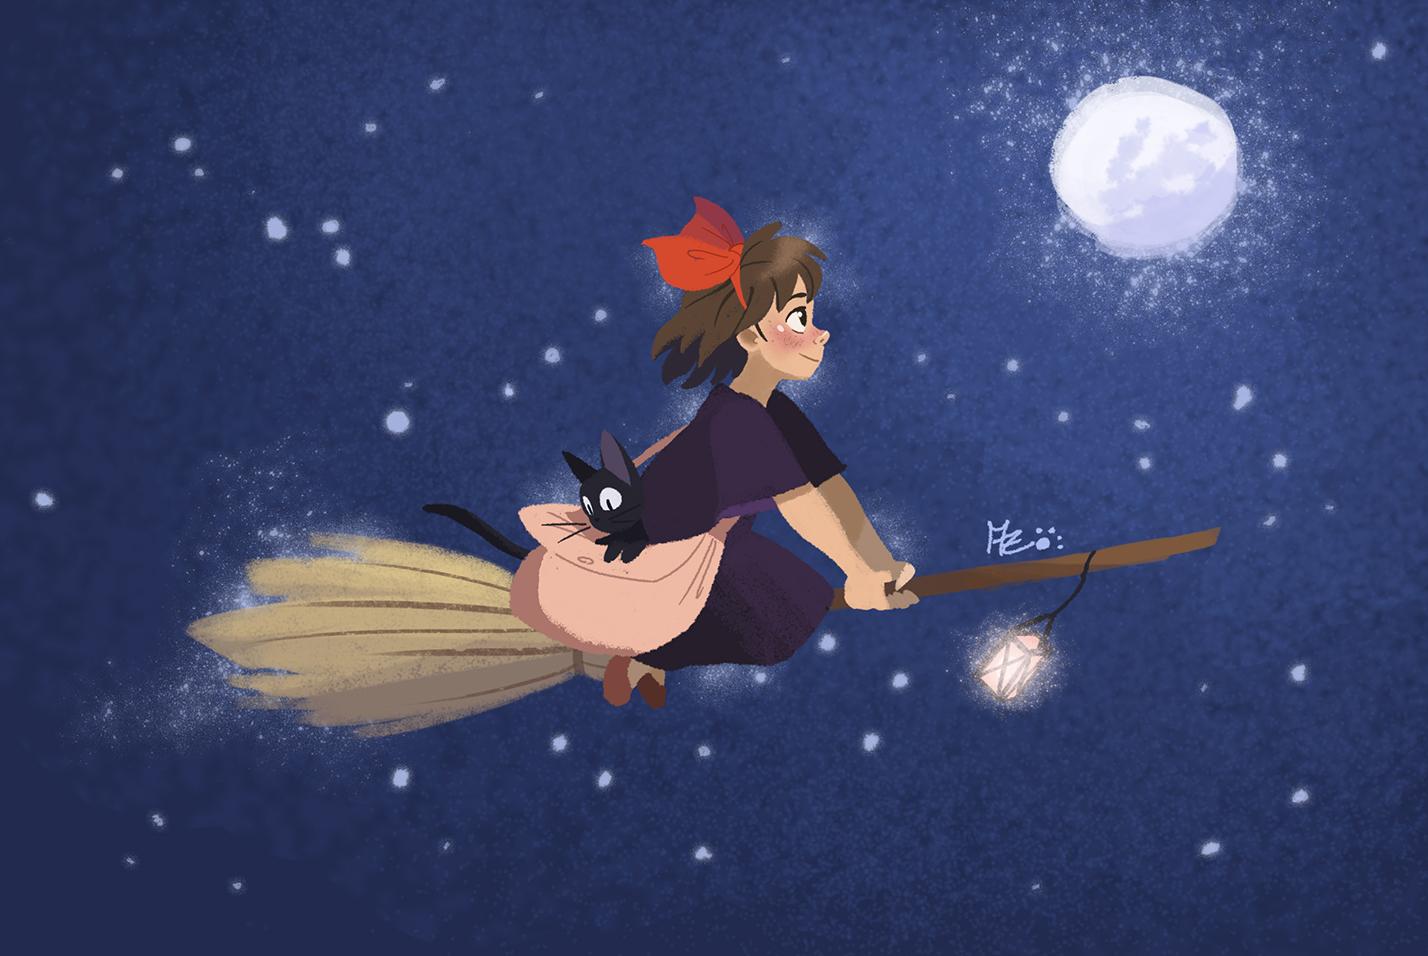 Kiki S Delivery Service Fond D Ecran Called Kiki And Ghibli